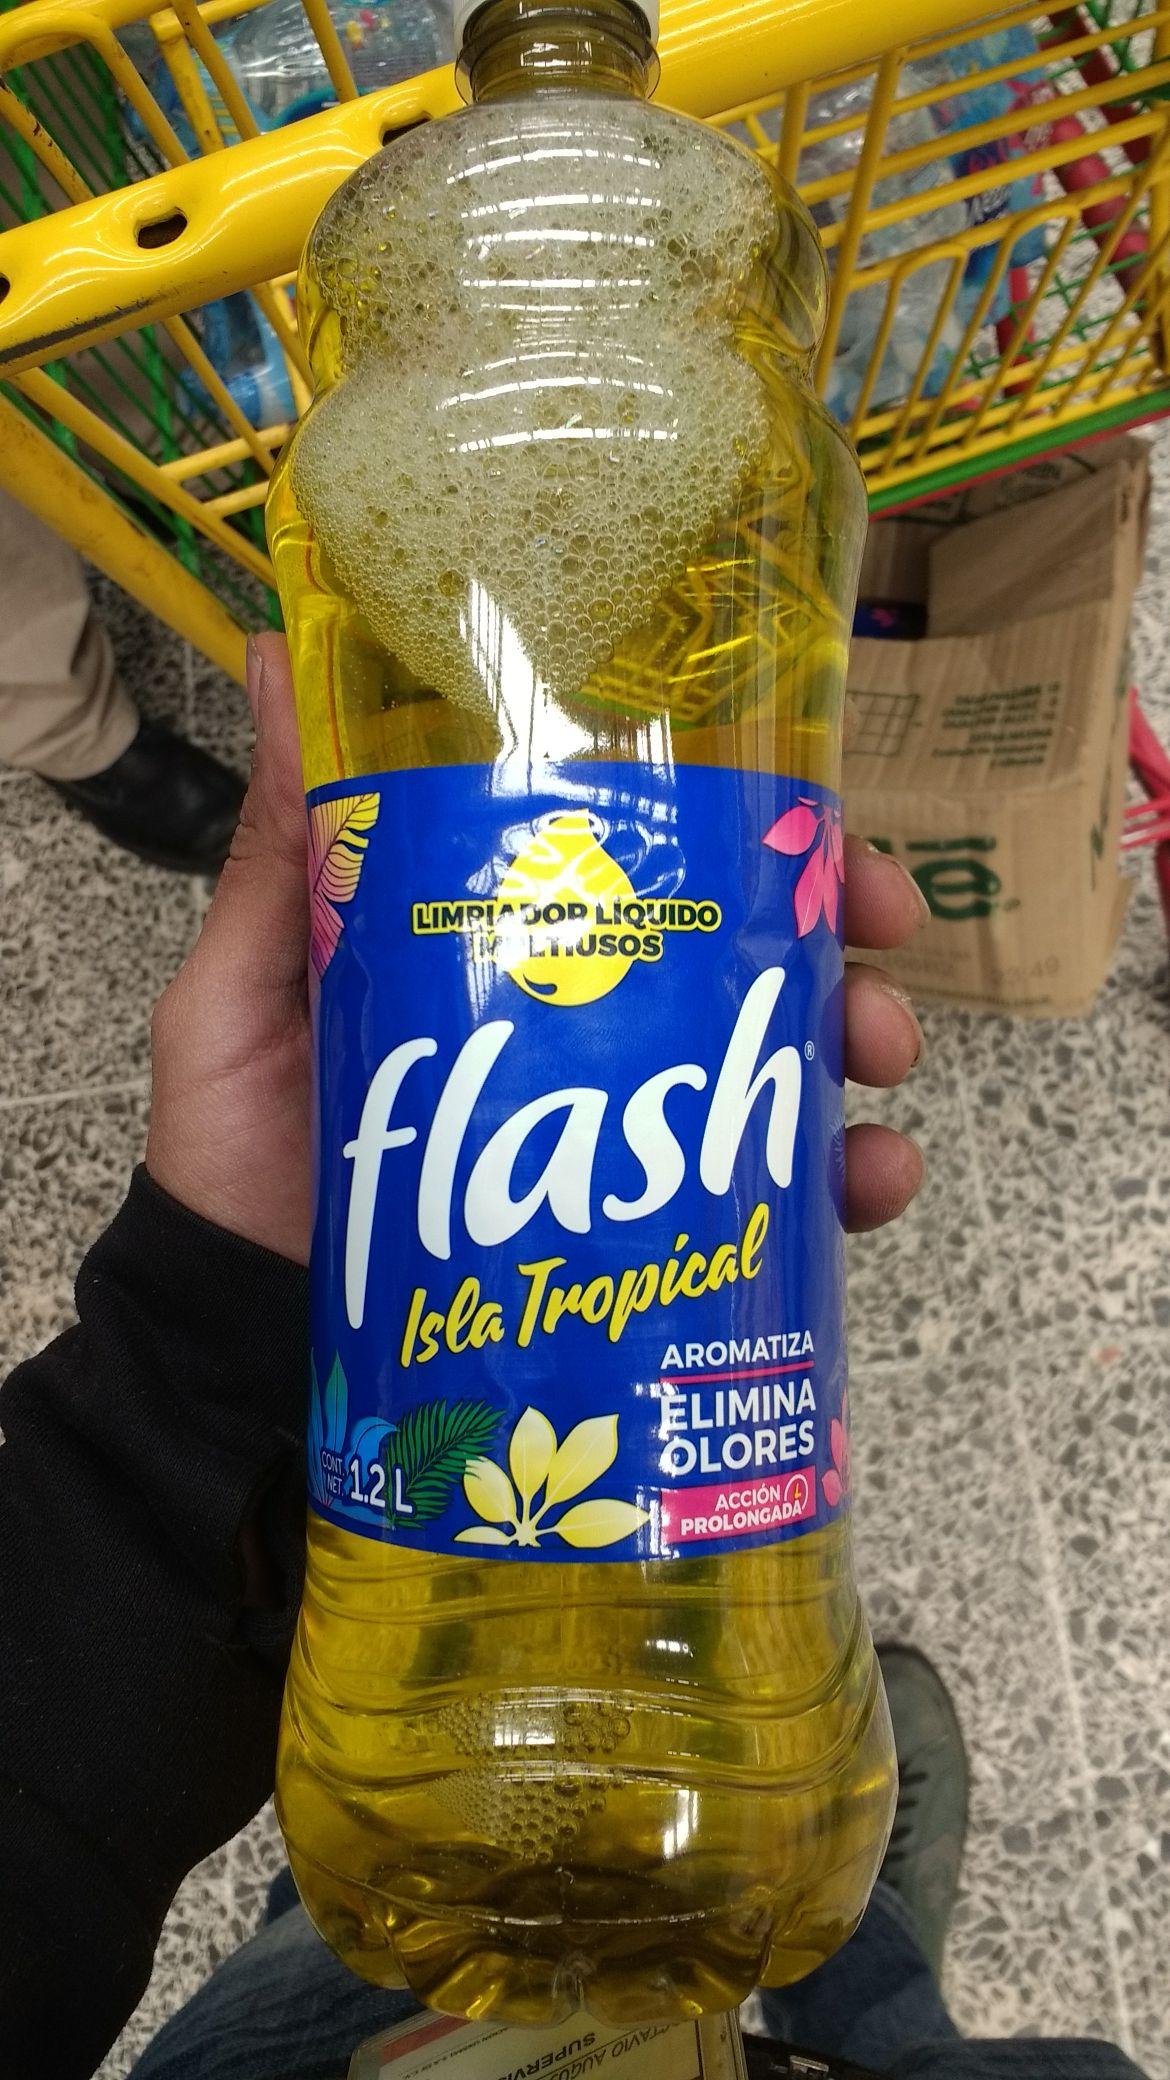 Bodega Aurrerá: reforma slp flash 1.2l segunda liquidacion